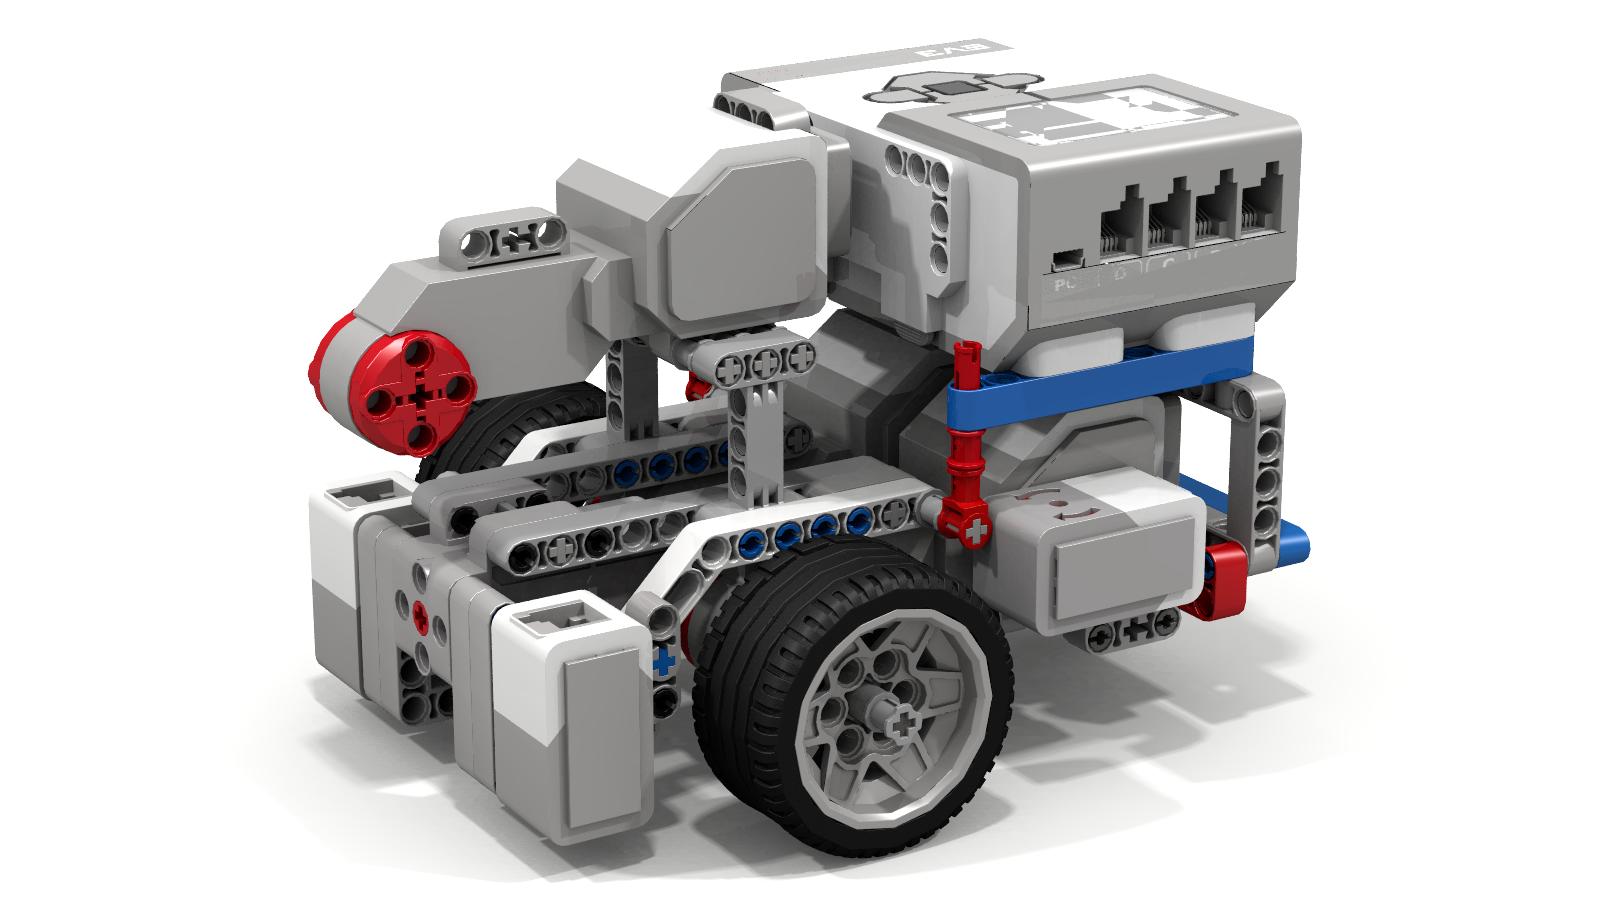 Ev3 Classroom Robot Design ~ Ev robots google search fll robot design pinterest